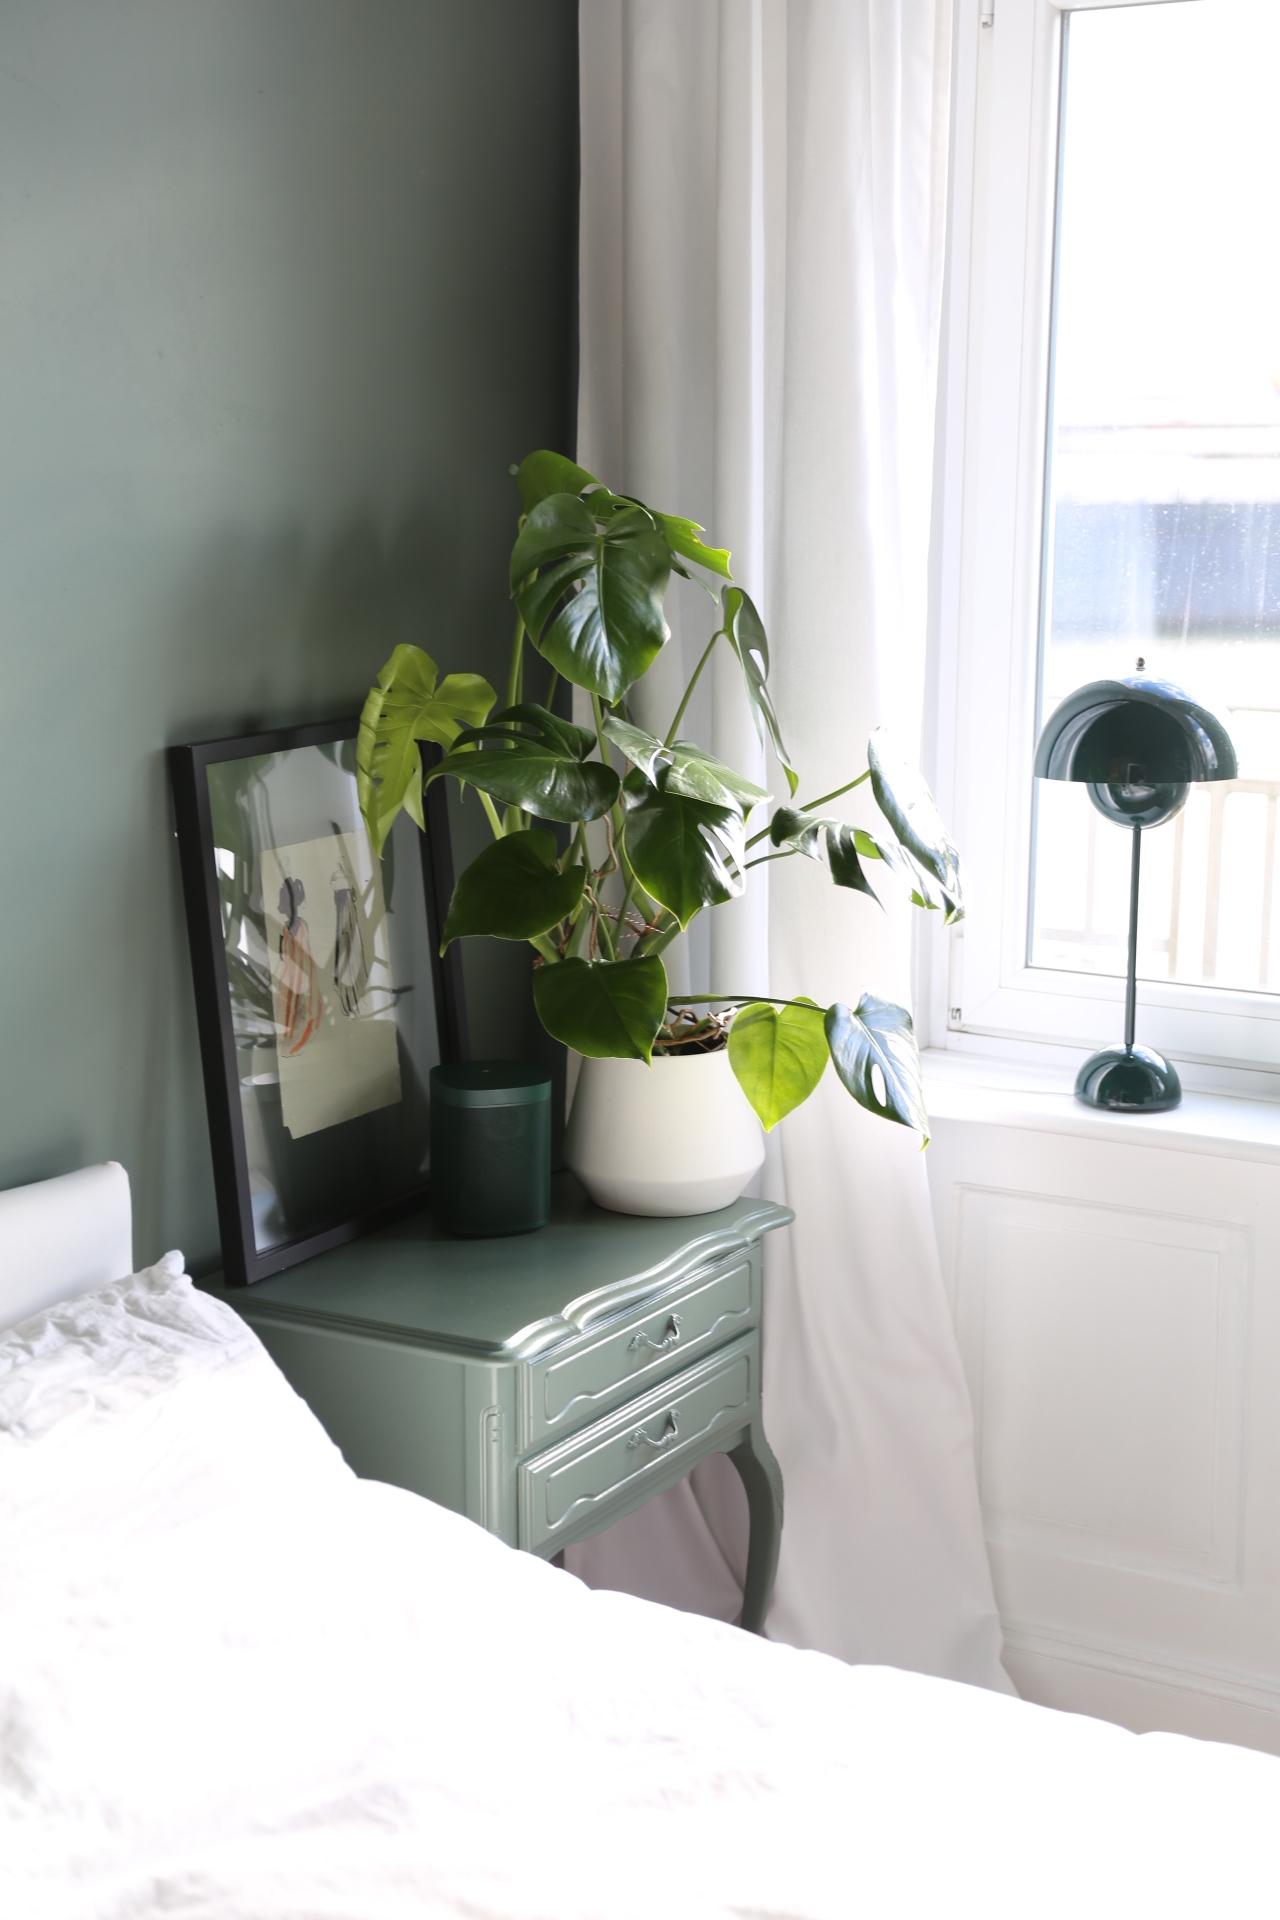 Sonos grün